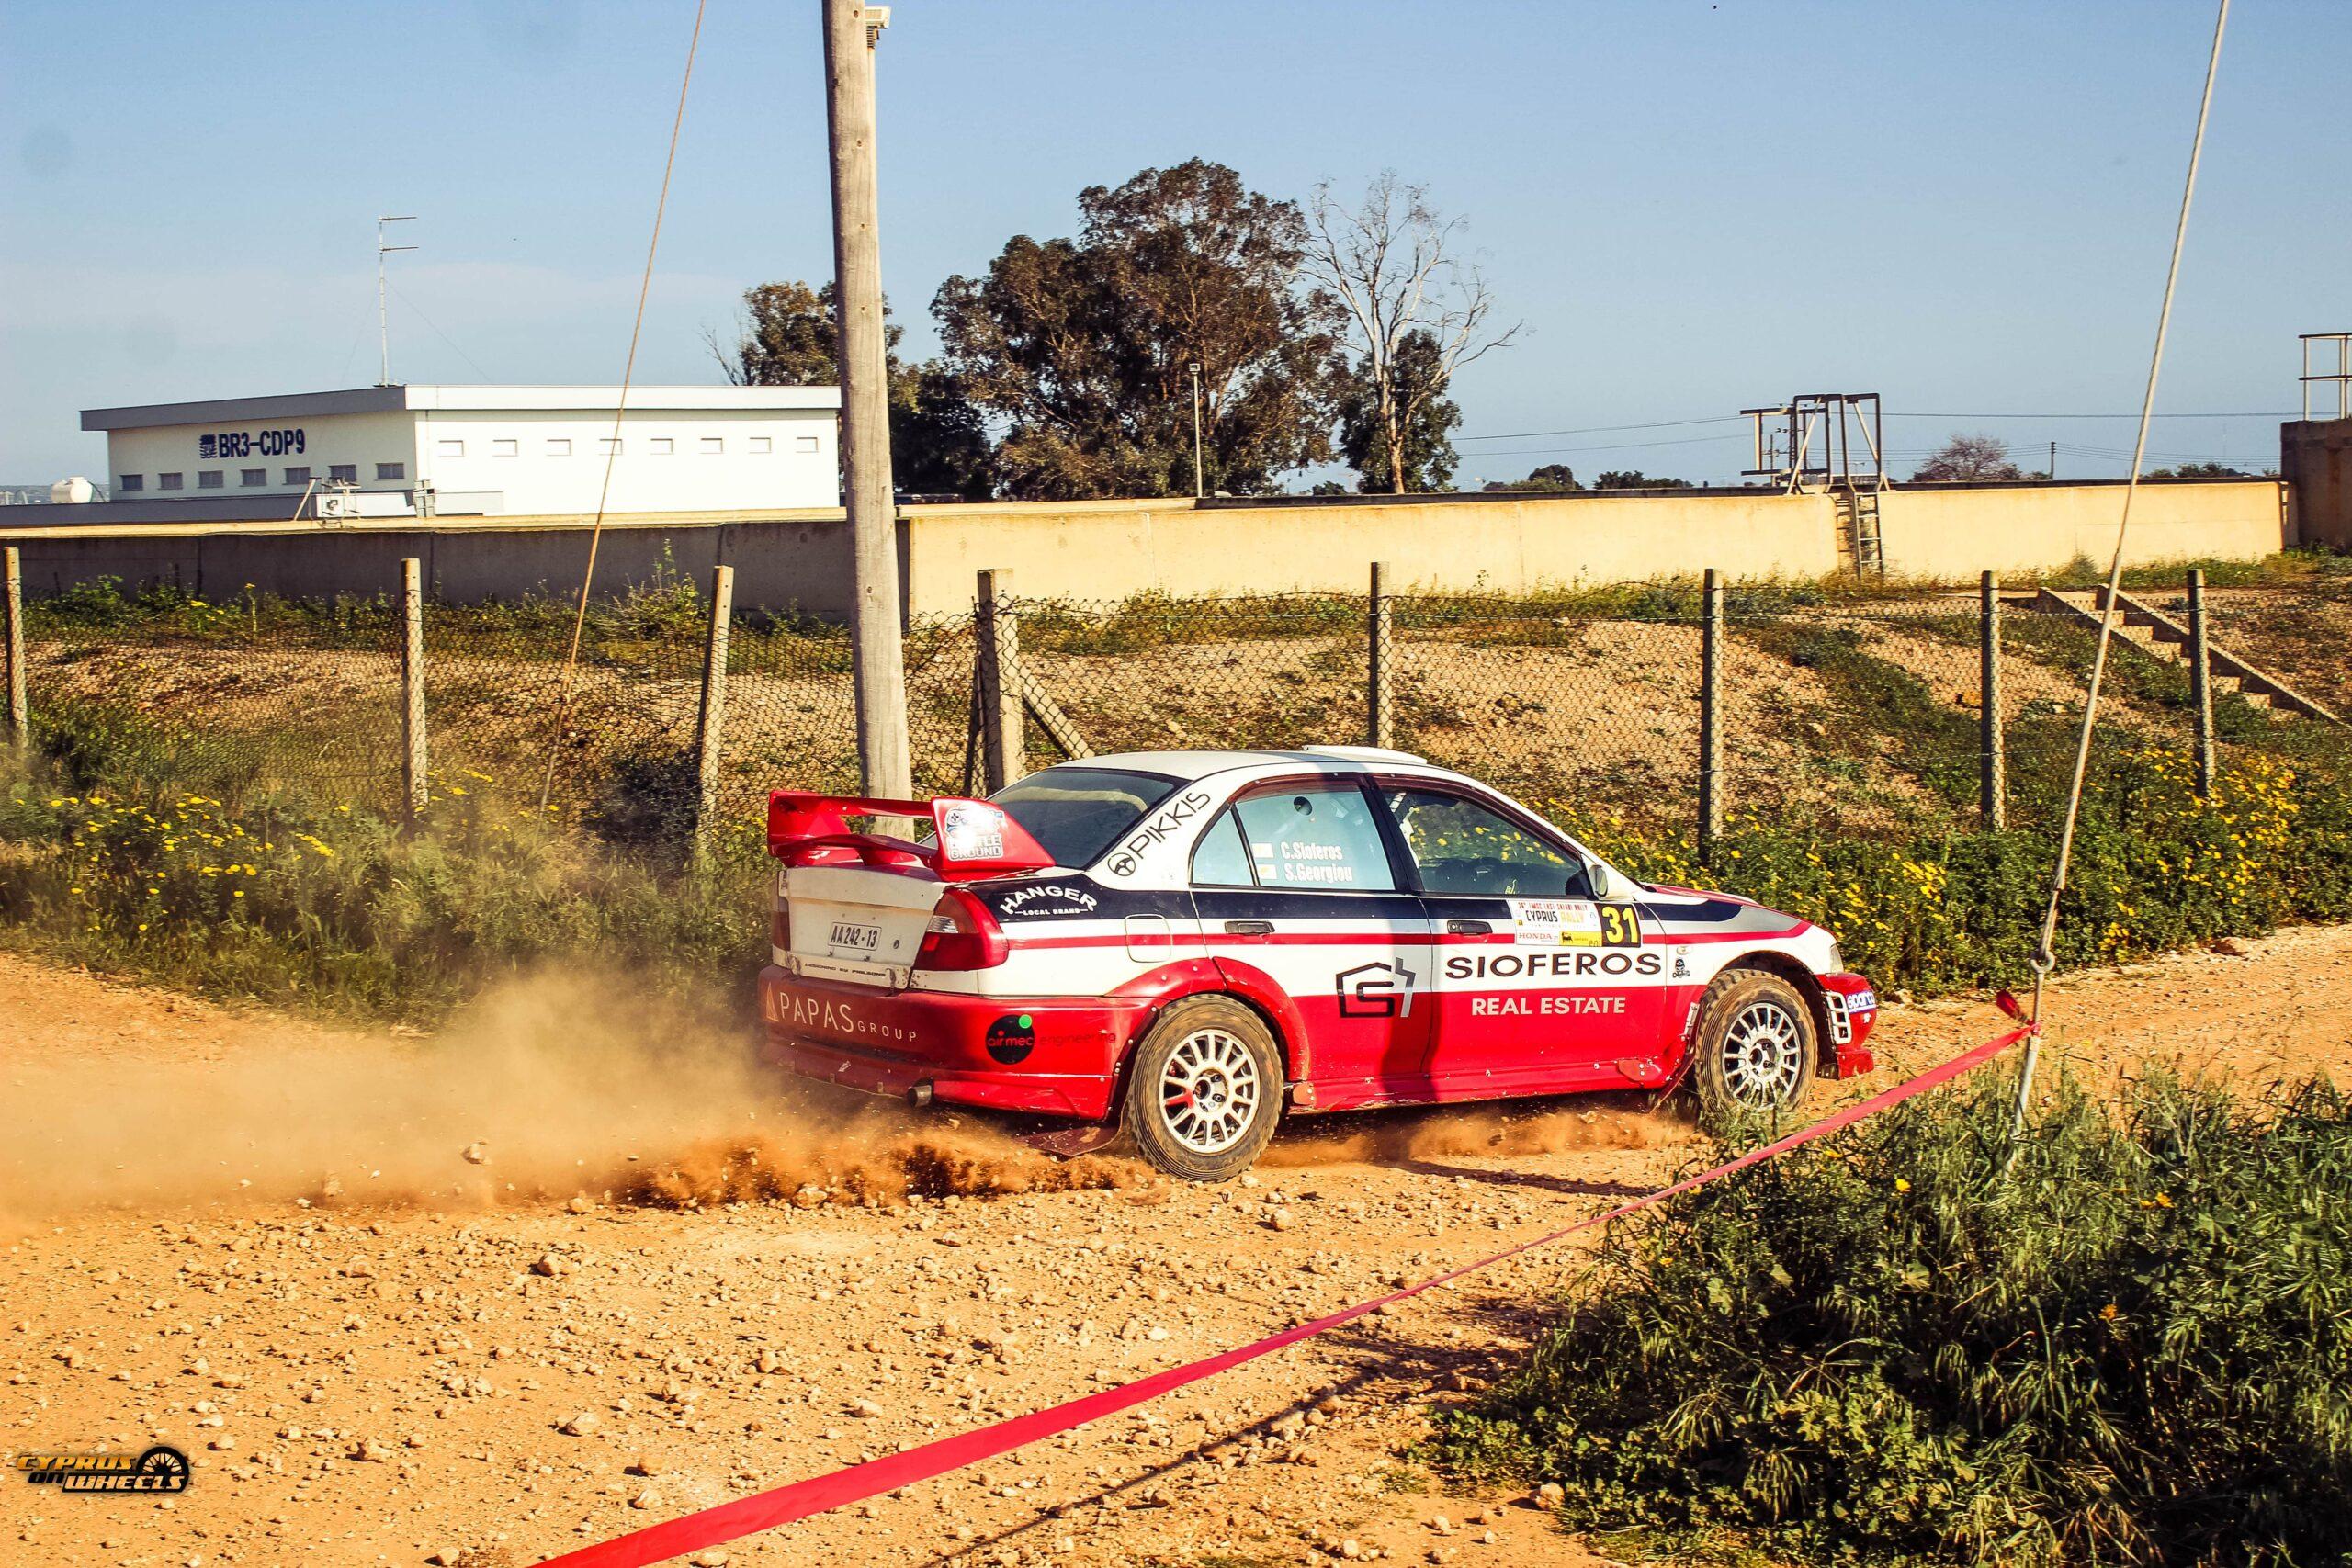 Evo 6 tme rally car